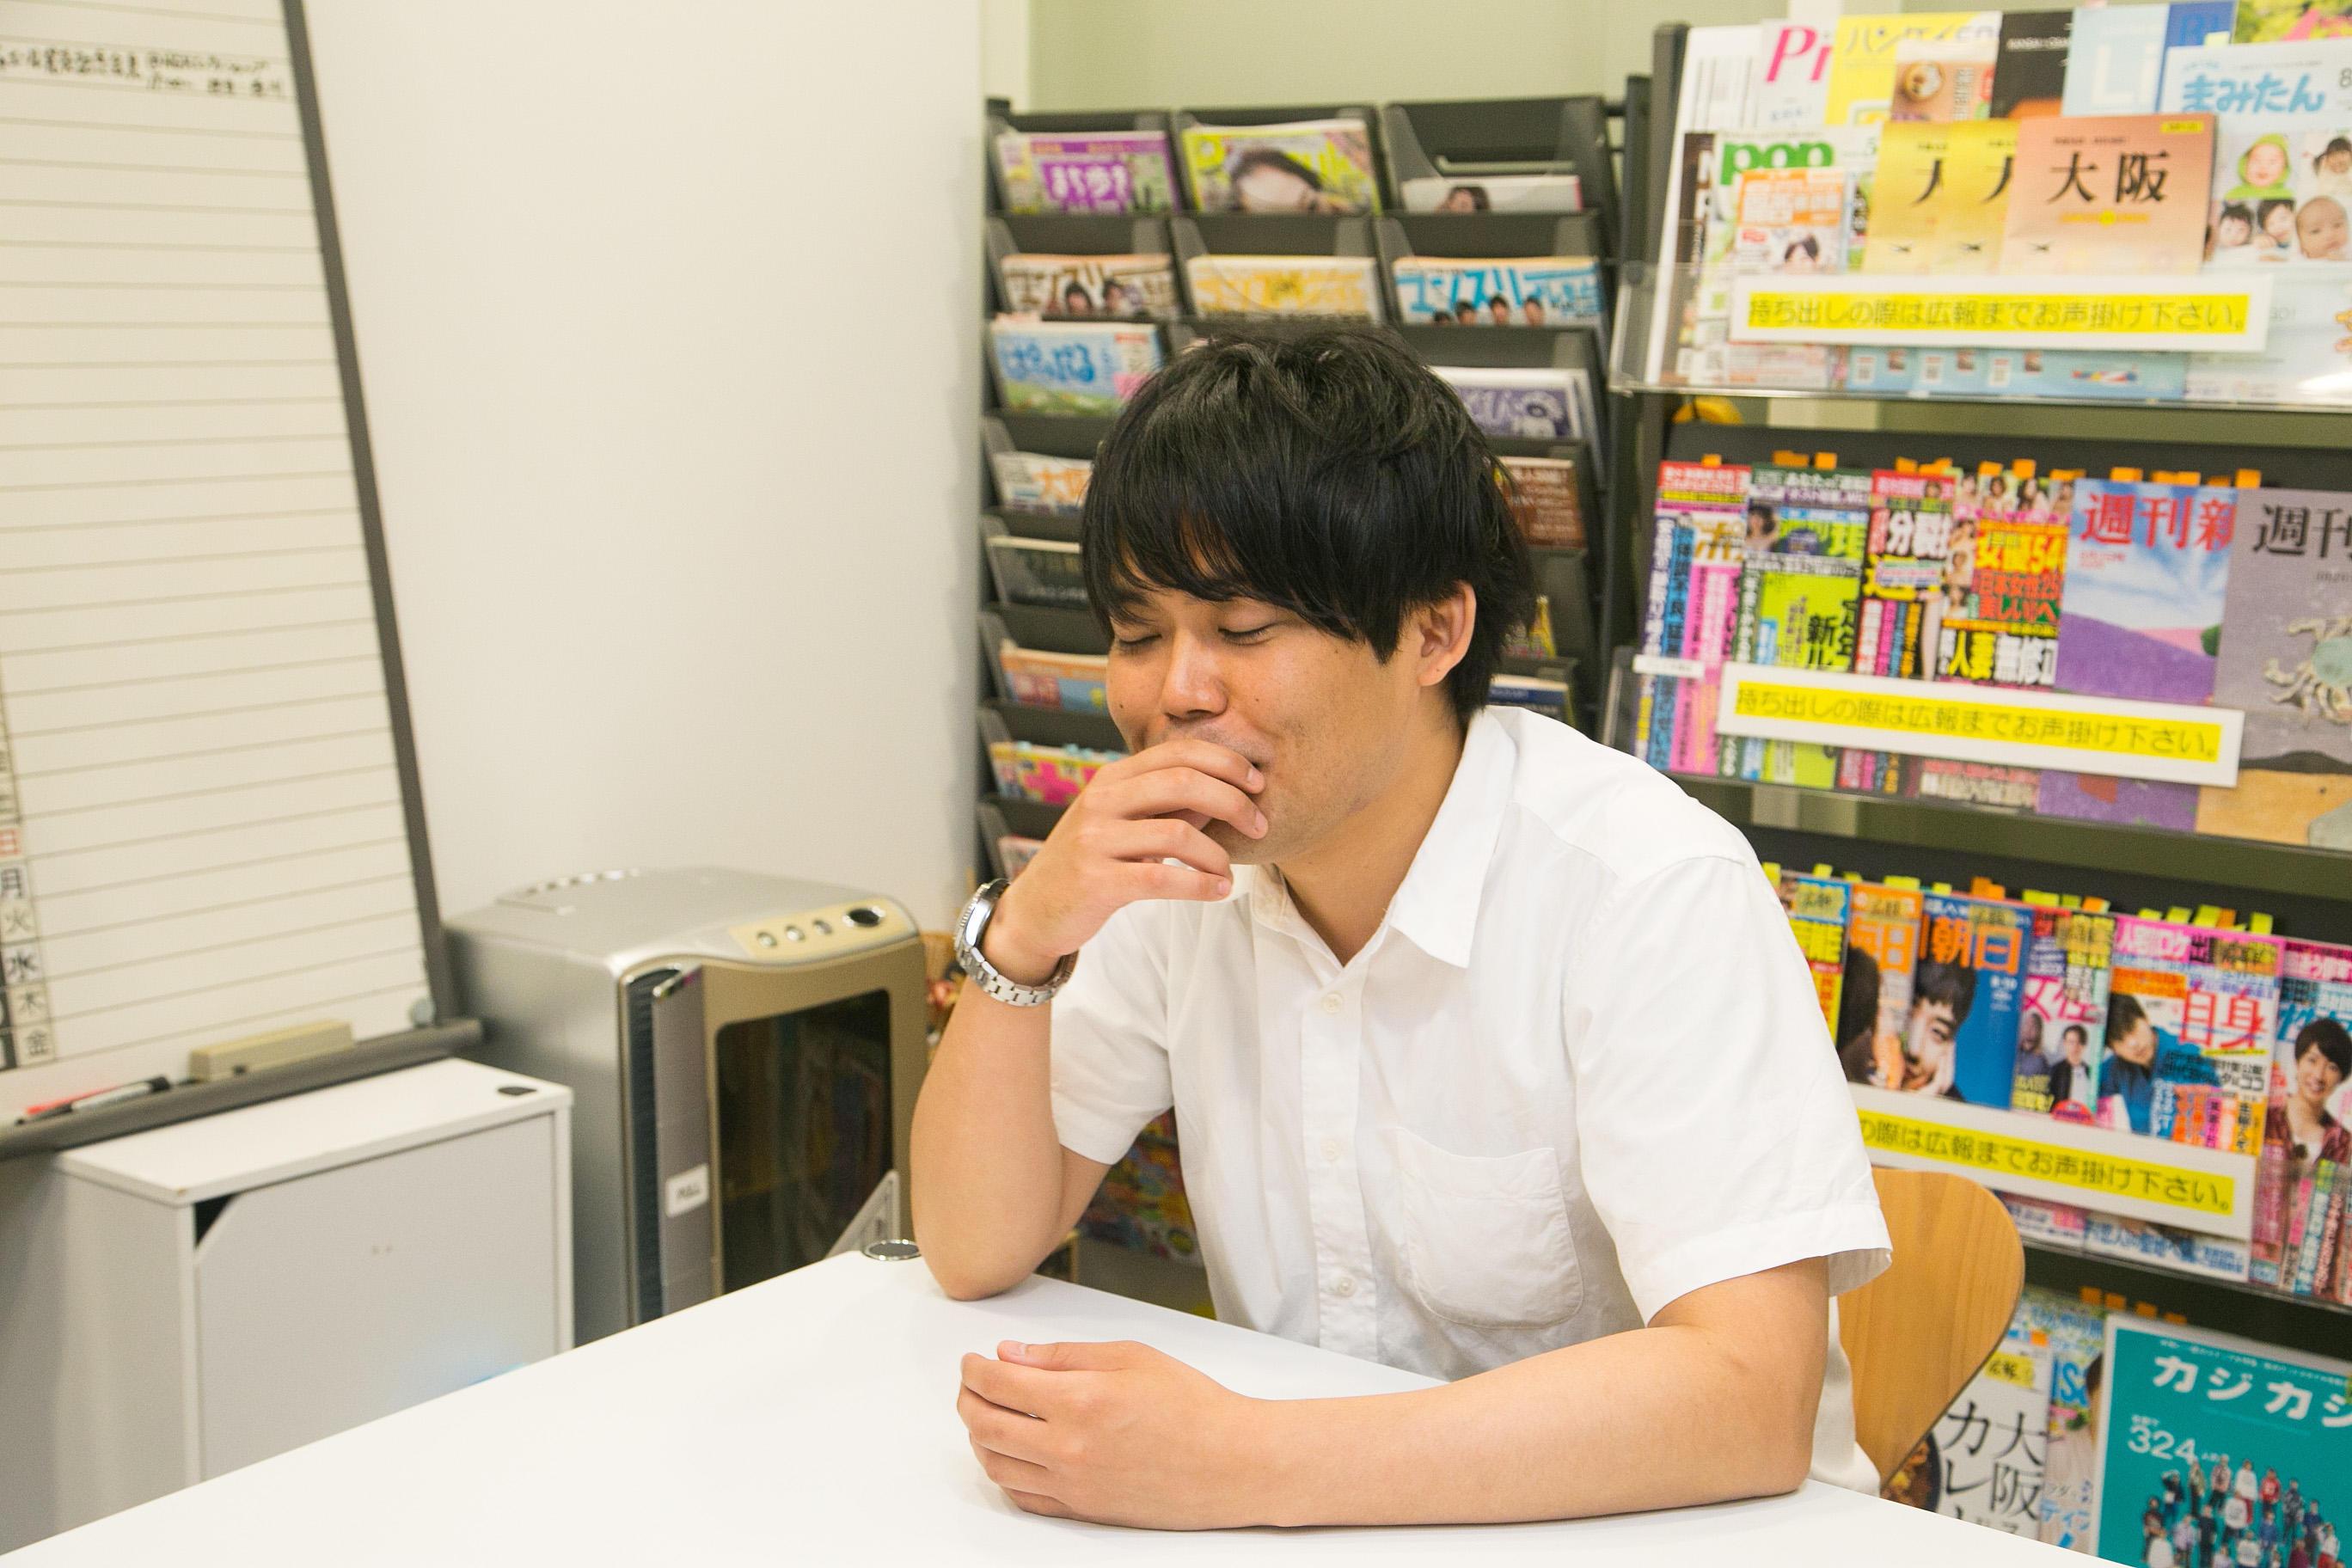 http://news.yoshimoto.co.jp/20180803180812-3bd8cb412f2f4fa556e09a8b4fd7abc106535a5a.jpg